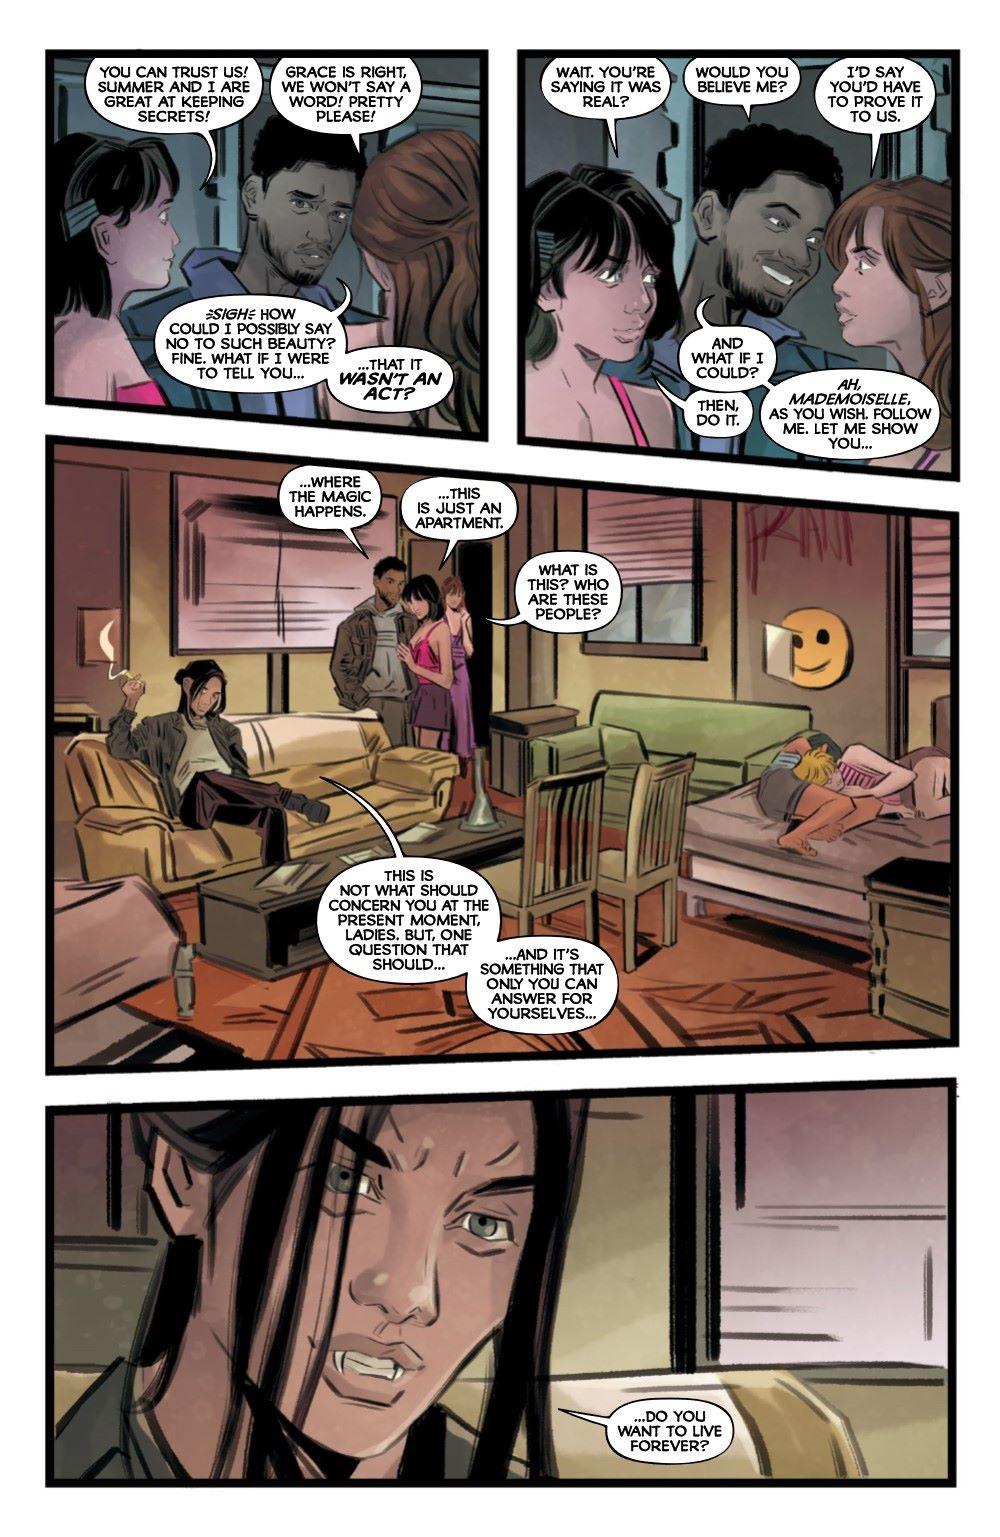 VAIN-4-MARKETING-08 ComicList Previews: THE VAIN #4